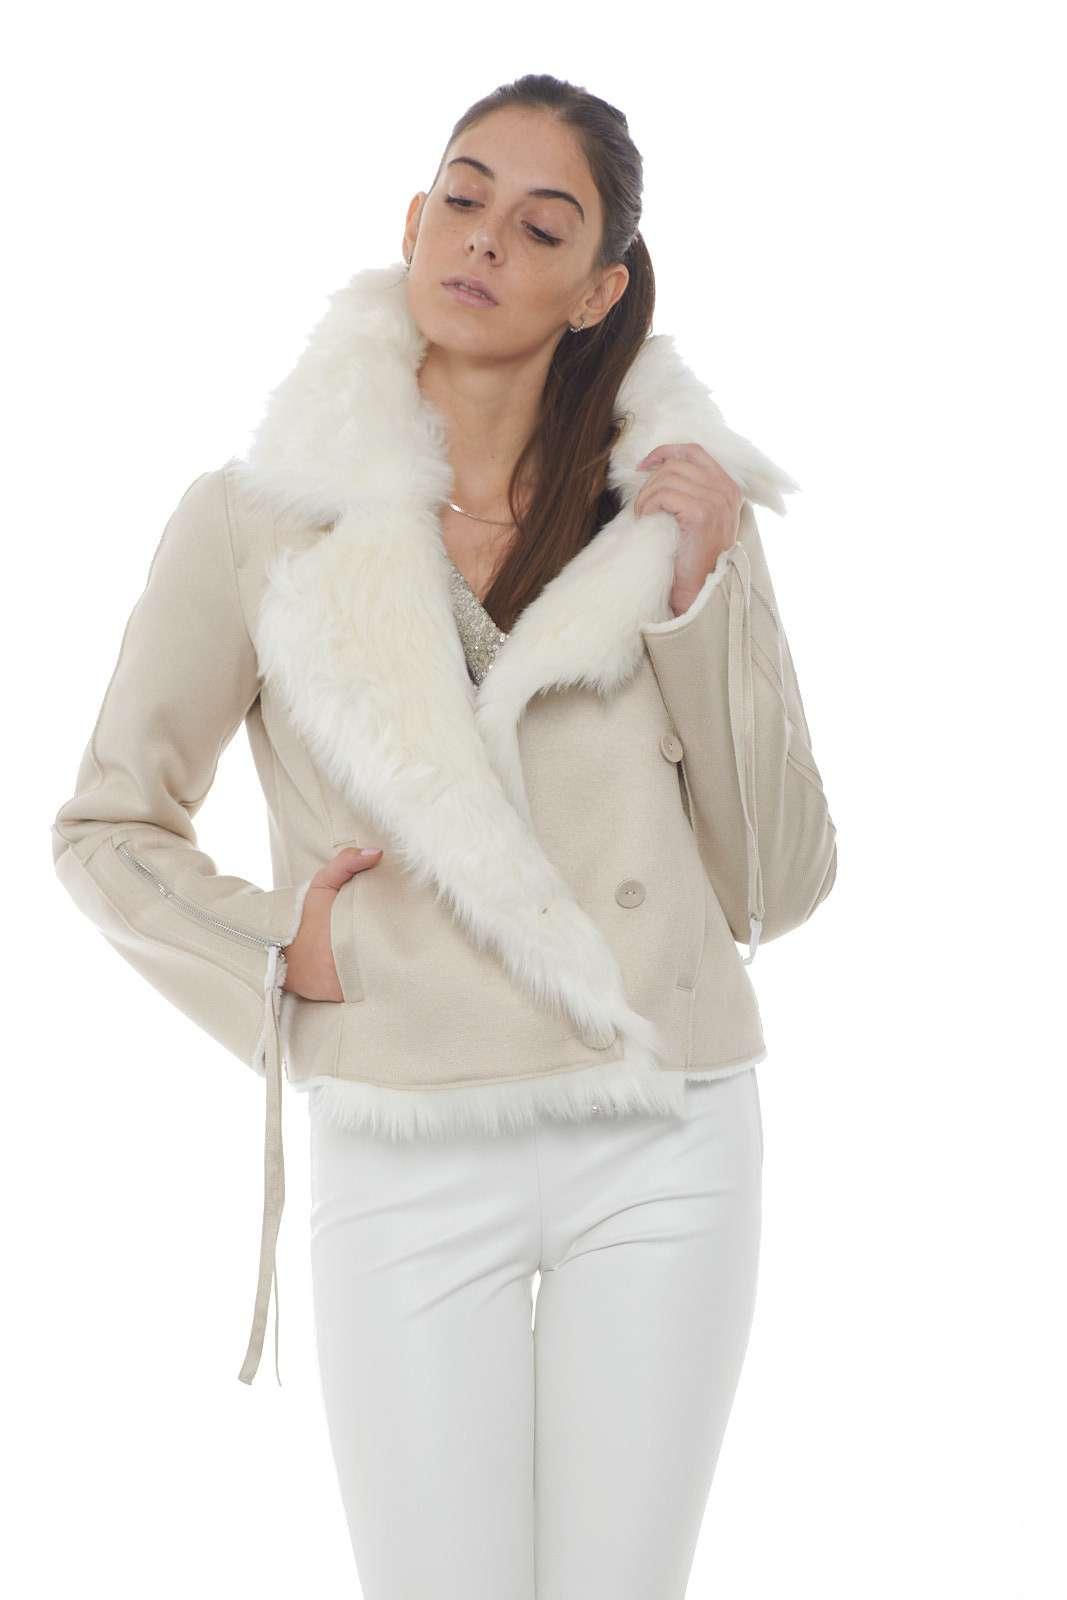 https://www.parmax.com/media/catalog/product/a/i/AI-outlet_parmax-giacca-donna-Patrizia-Pepe-2l0847-A.jpg